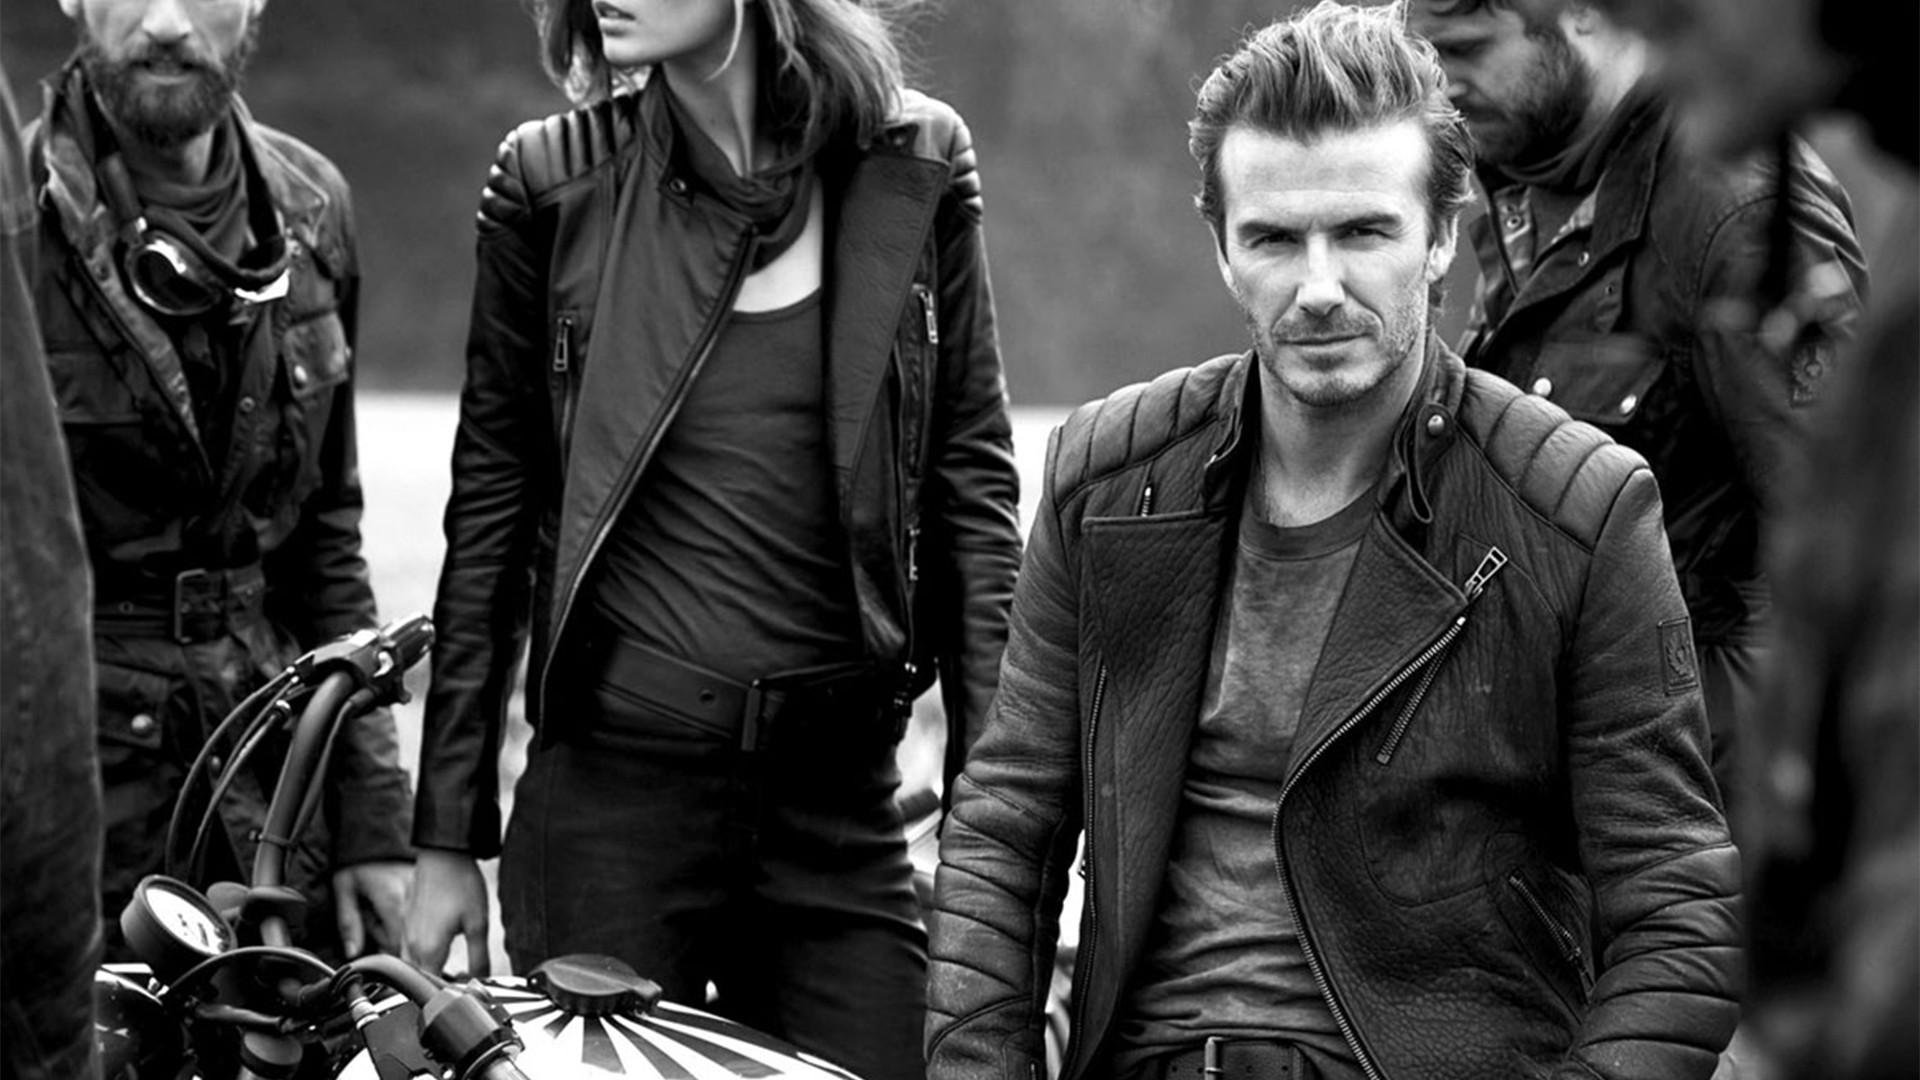 Res: 1920x1080, David Beckham Motorcycle Style